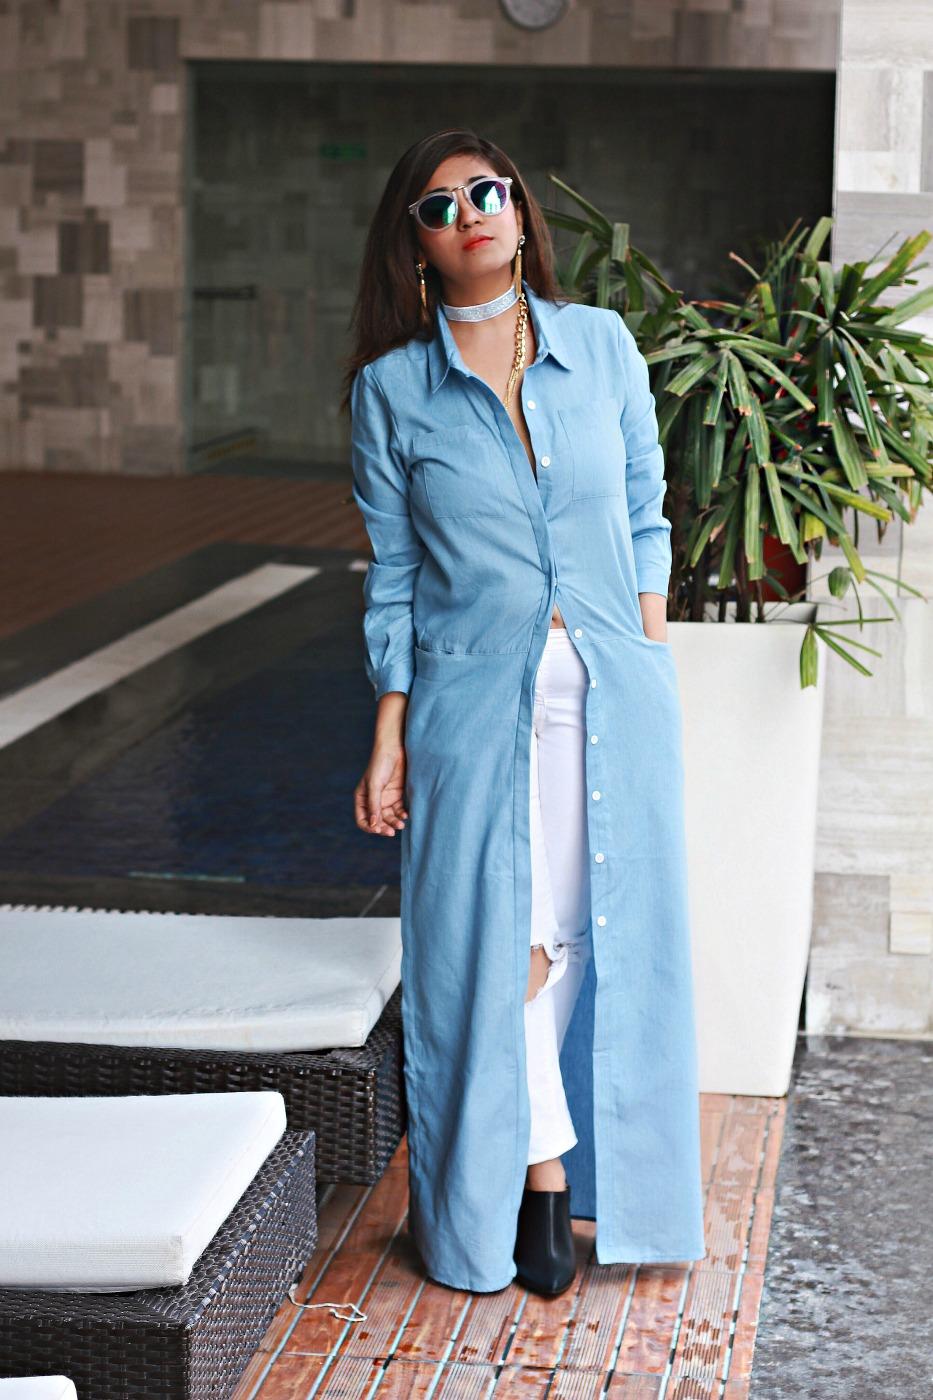 fahion blogger best street style indian fashion blog